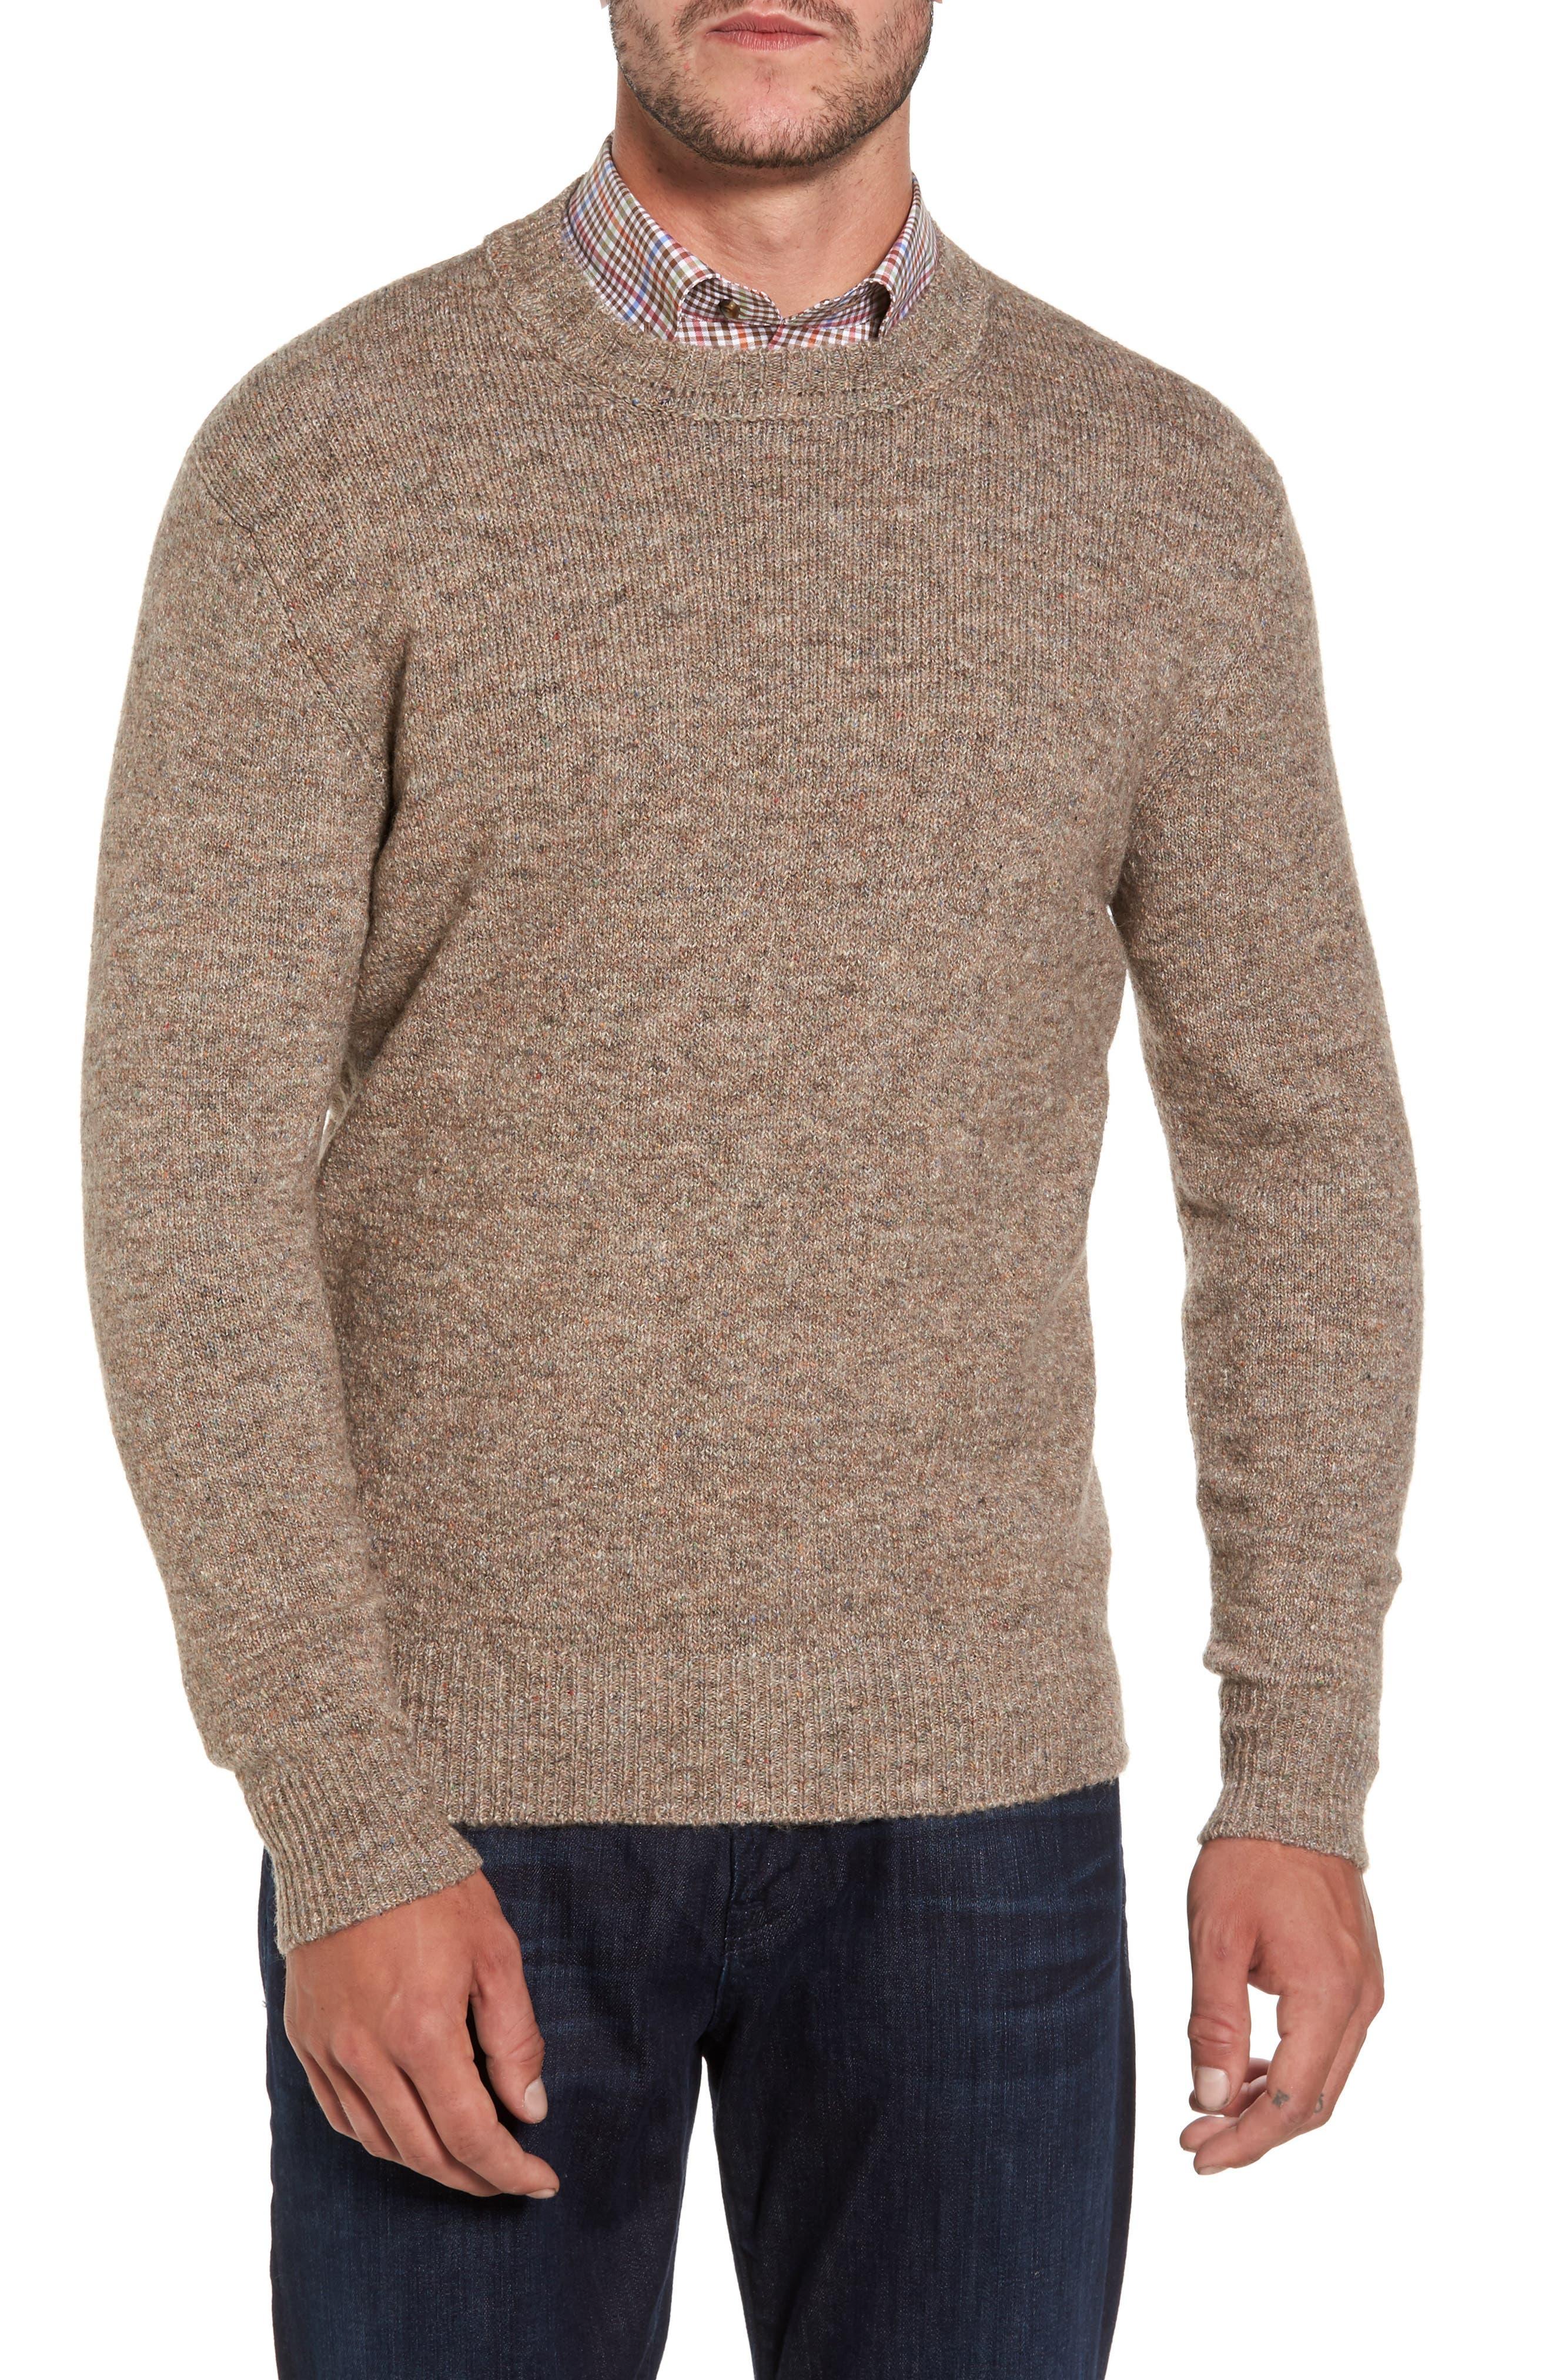 Tweed Crewneck Sweater,                             Main thumbnail 1, color,                             Sand